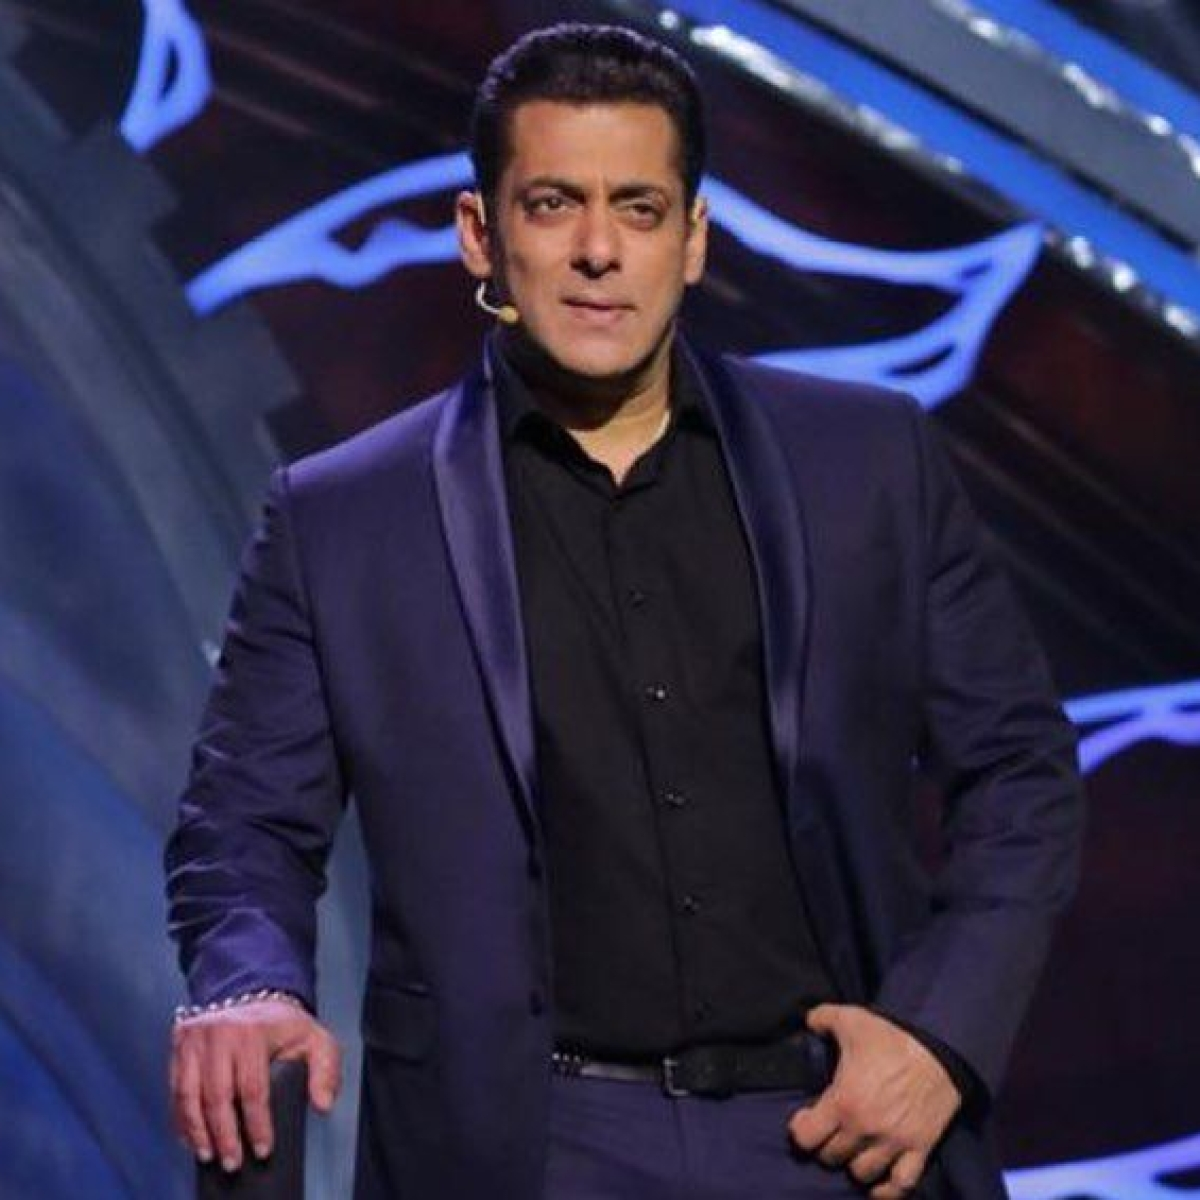 Bigg Boss 14: Salman Khan scolds Rakhi Sawant, asks her to leave the show right away